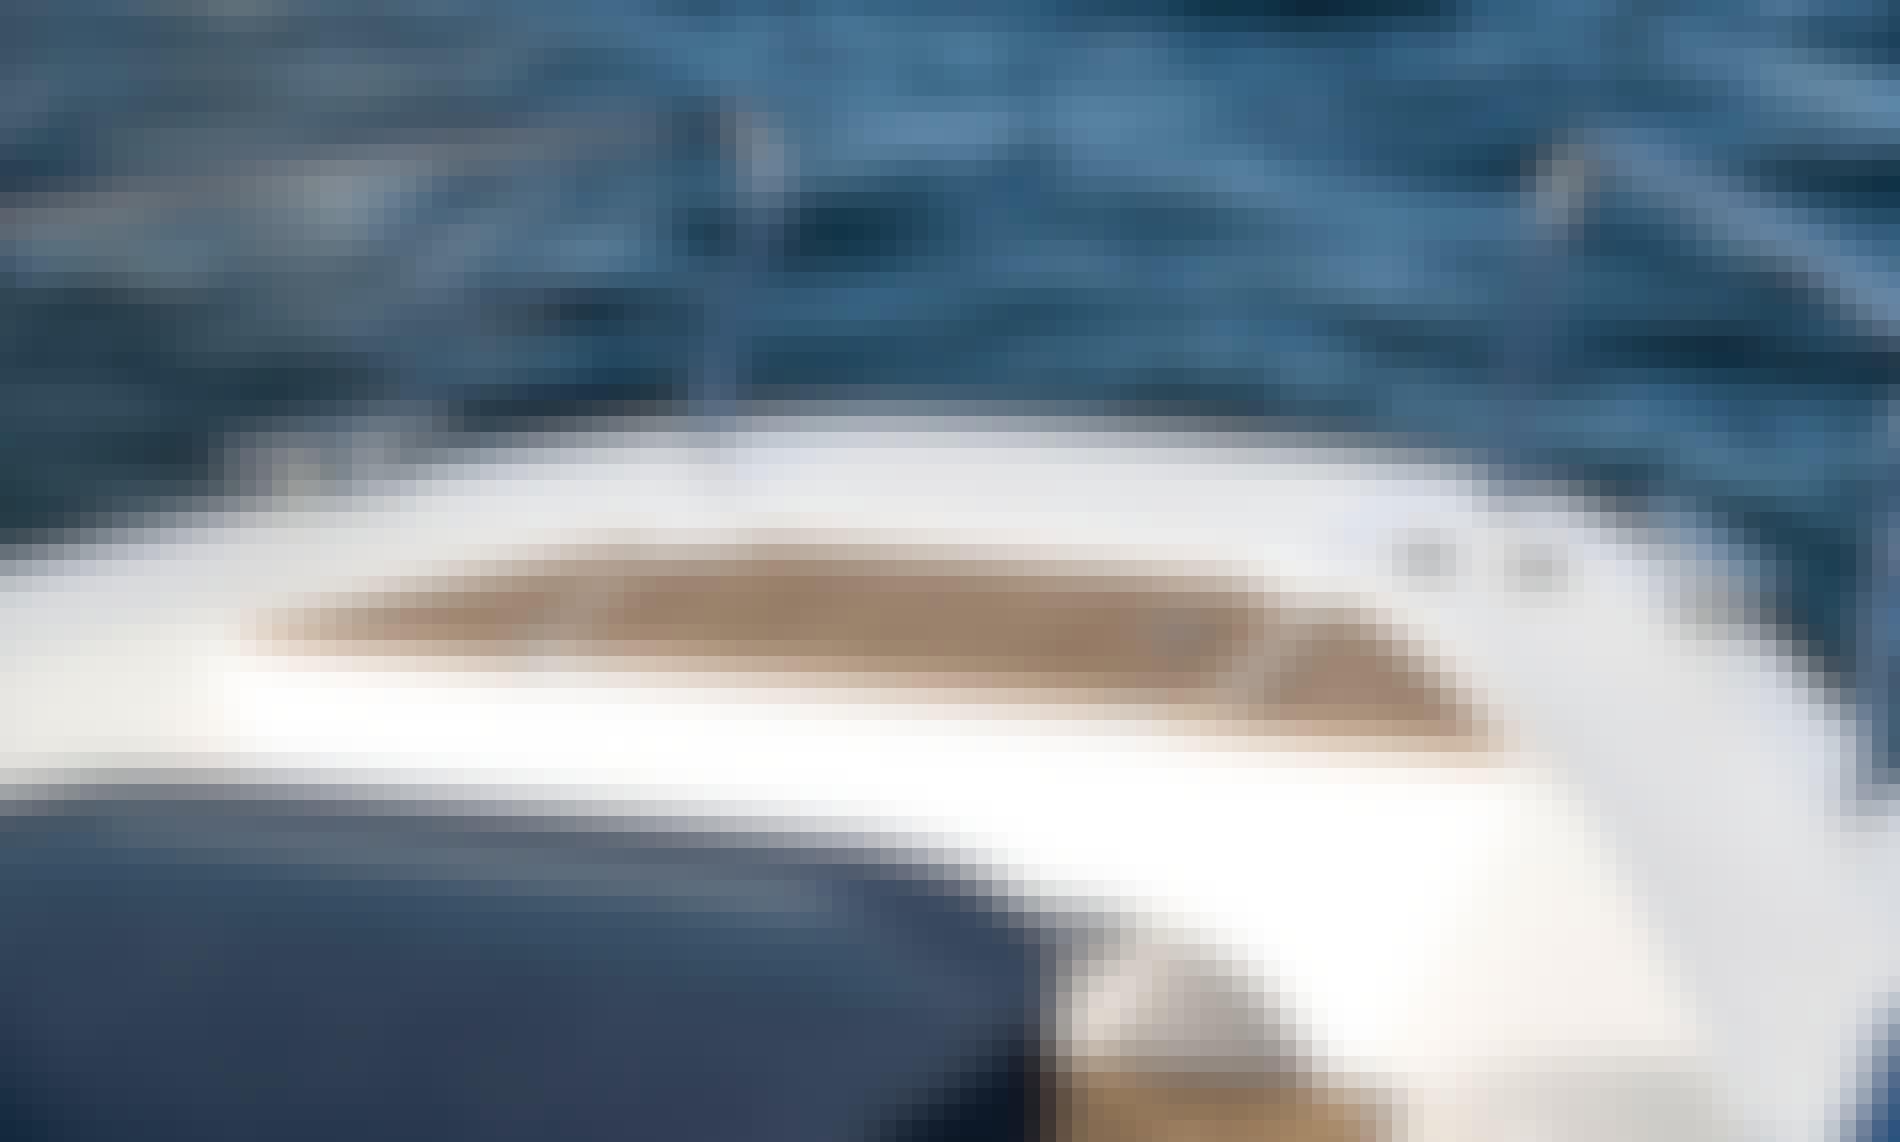 Nimbus T11 – 2x300HP V8 Verado